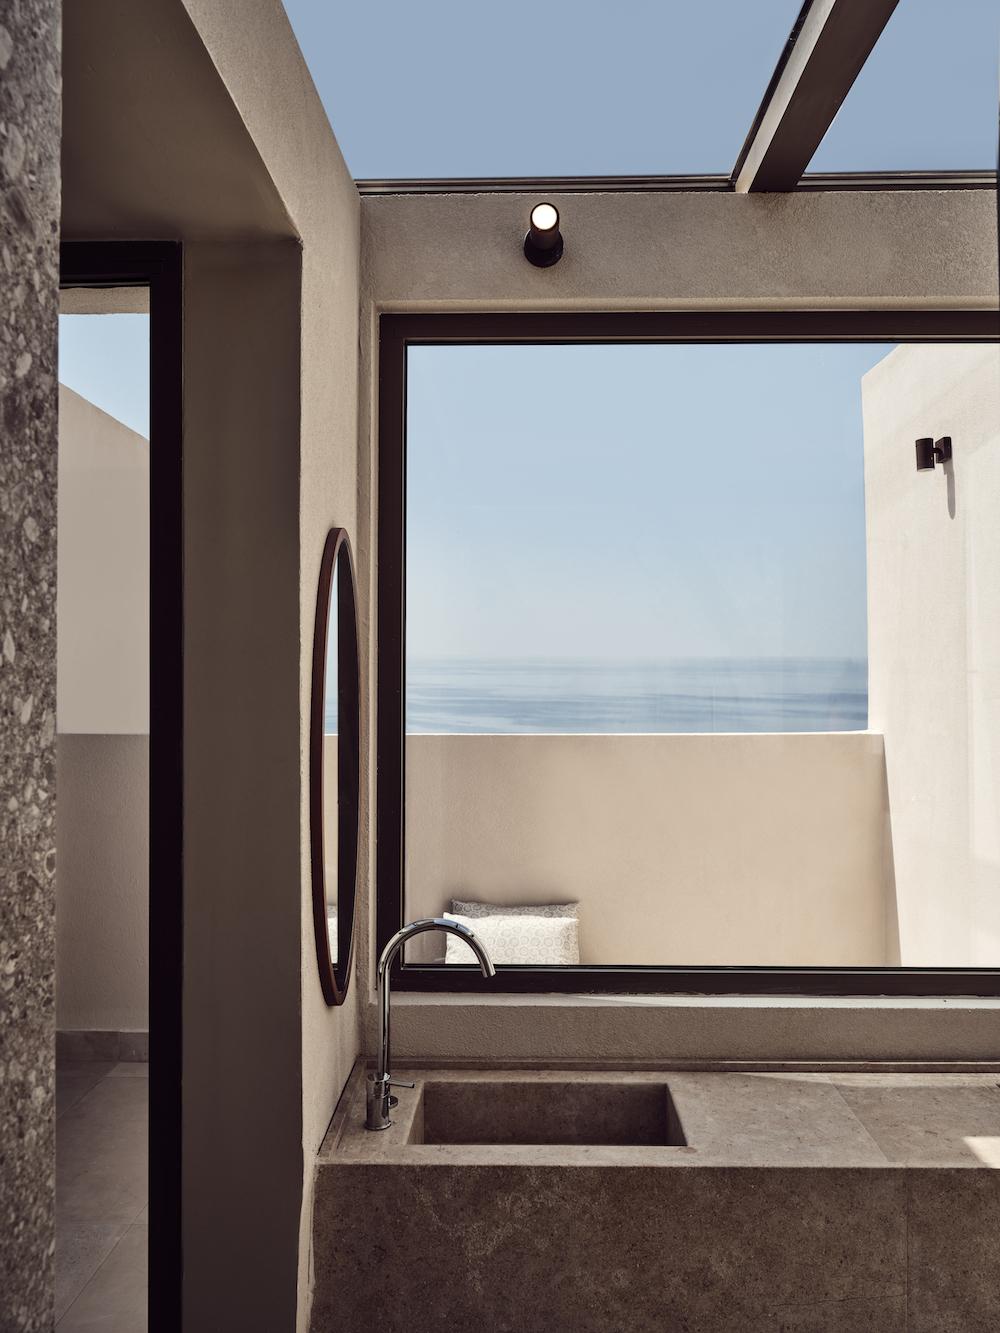 Architectural bathroom inside hotel